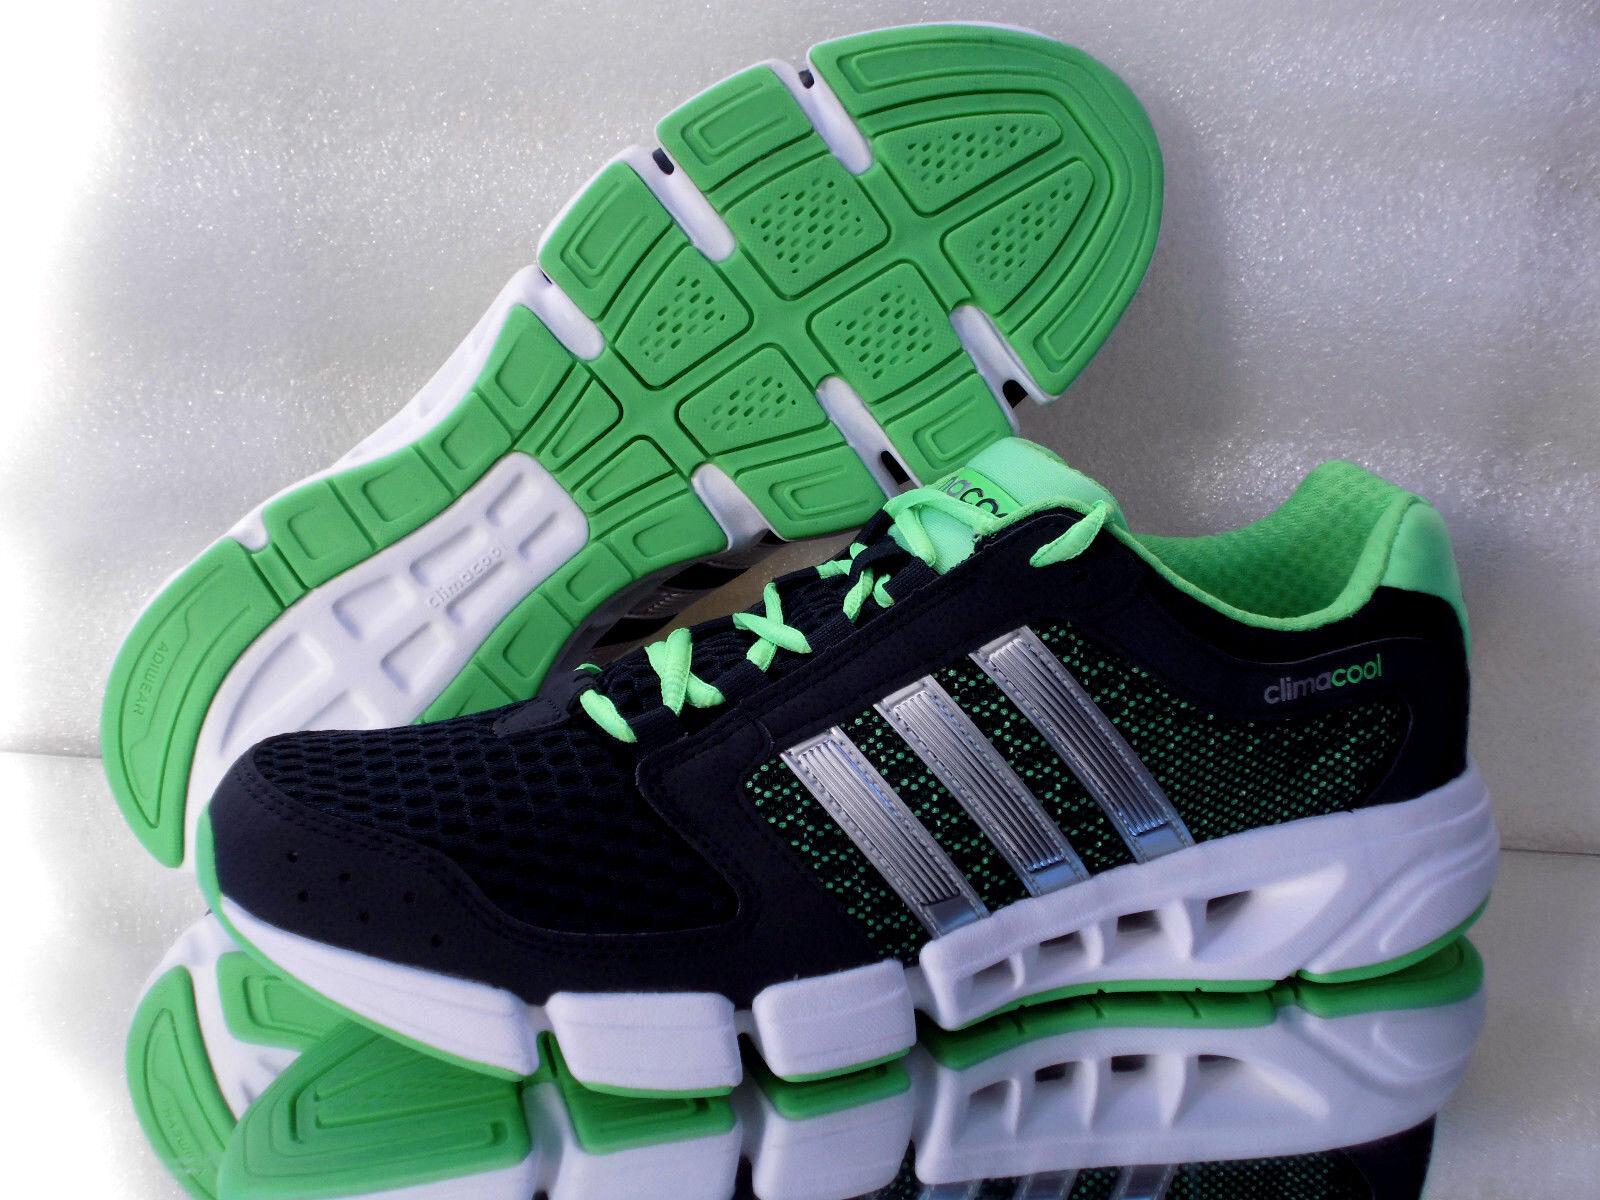 Adidas CC Solution Turn/ 2.0 Clima Cool Men Turn/ Solution Laufschuhe Sneaker Q21120 Neu 93b73a